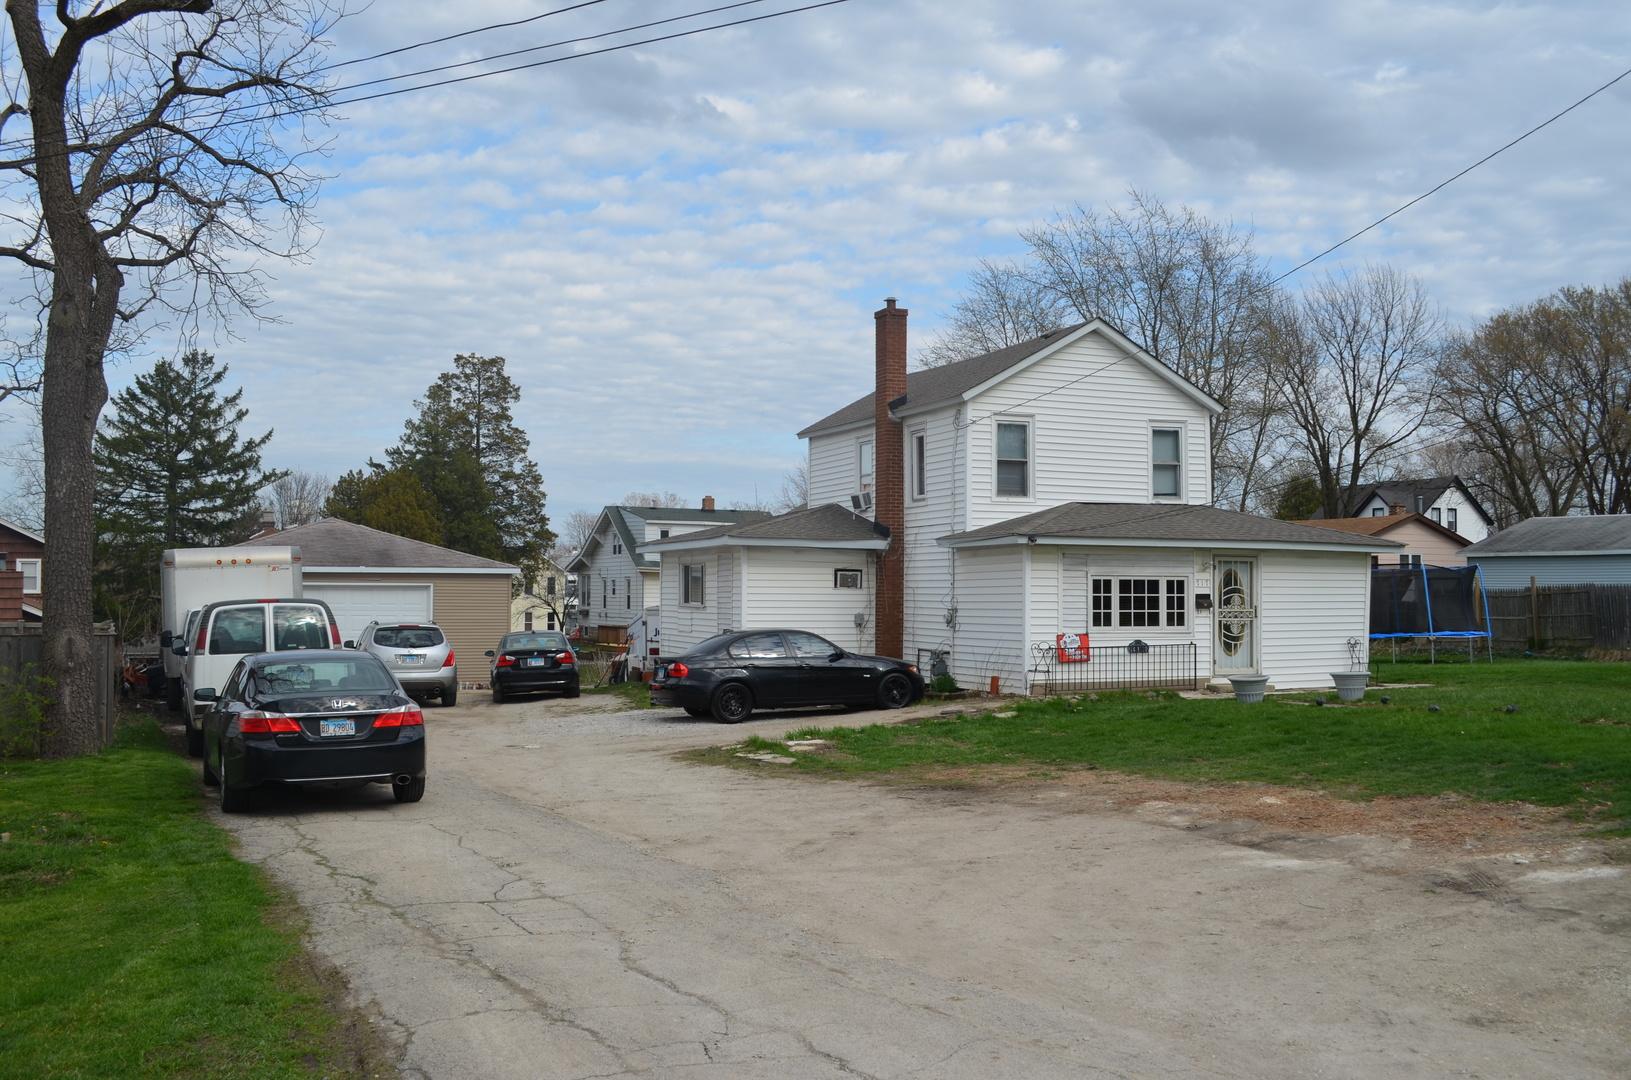 715-17 STATE, LEMONT, Illinois, 60439